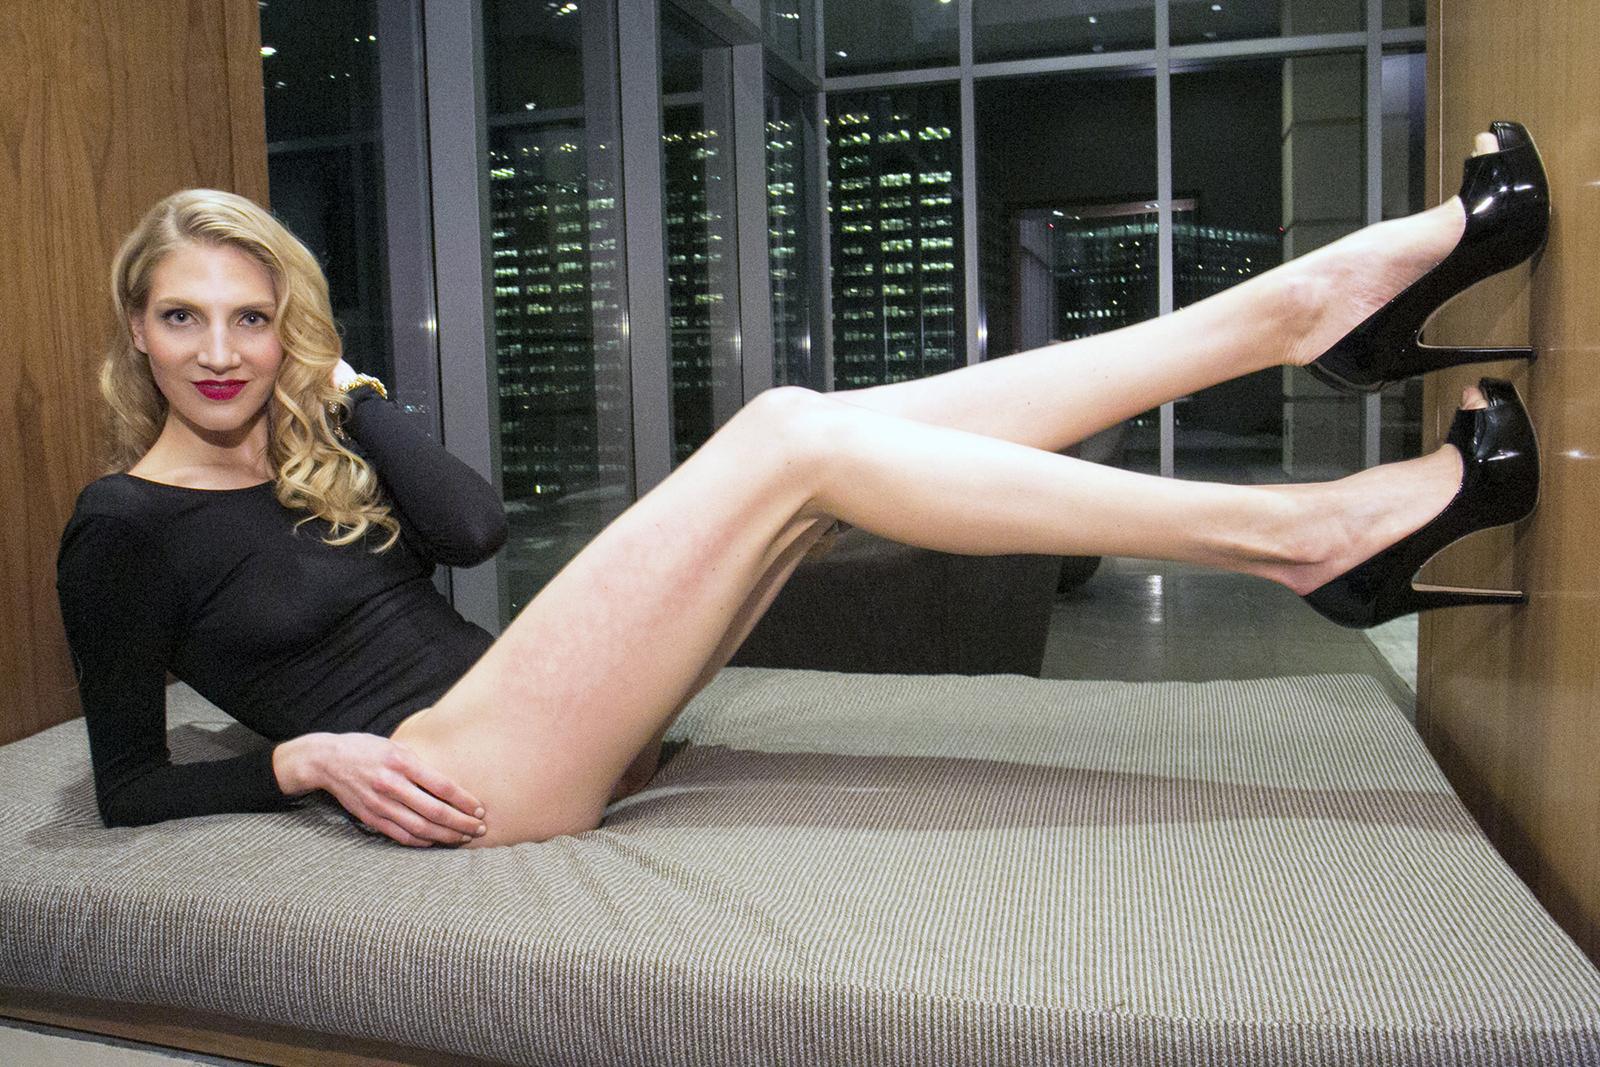 Dark haired girl Kirsten Plant is spreading her slim legs wide open № 1023669 бесплатно